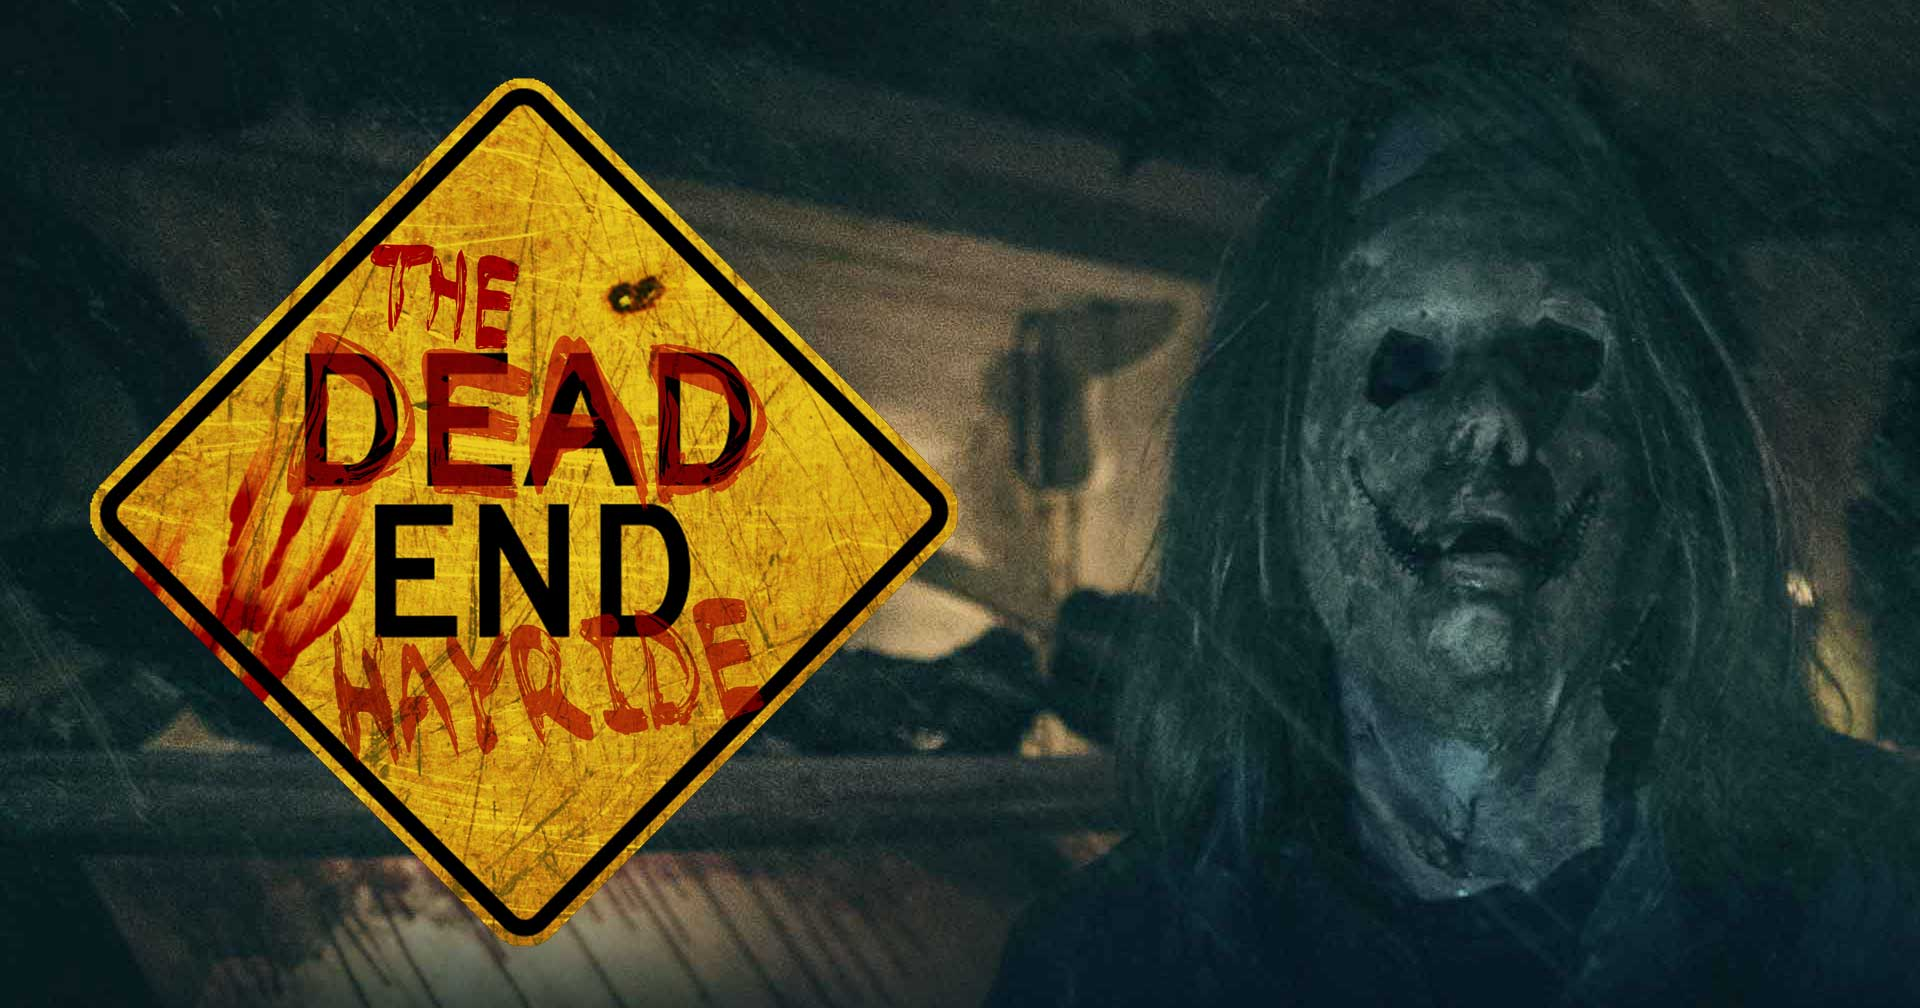 The Dead End Haunted Hayride Minneapolis St Paul Haunted